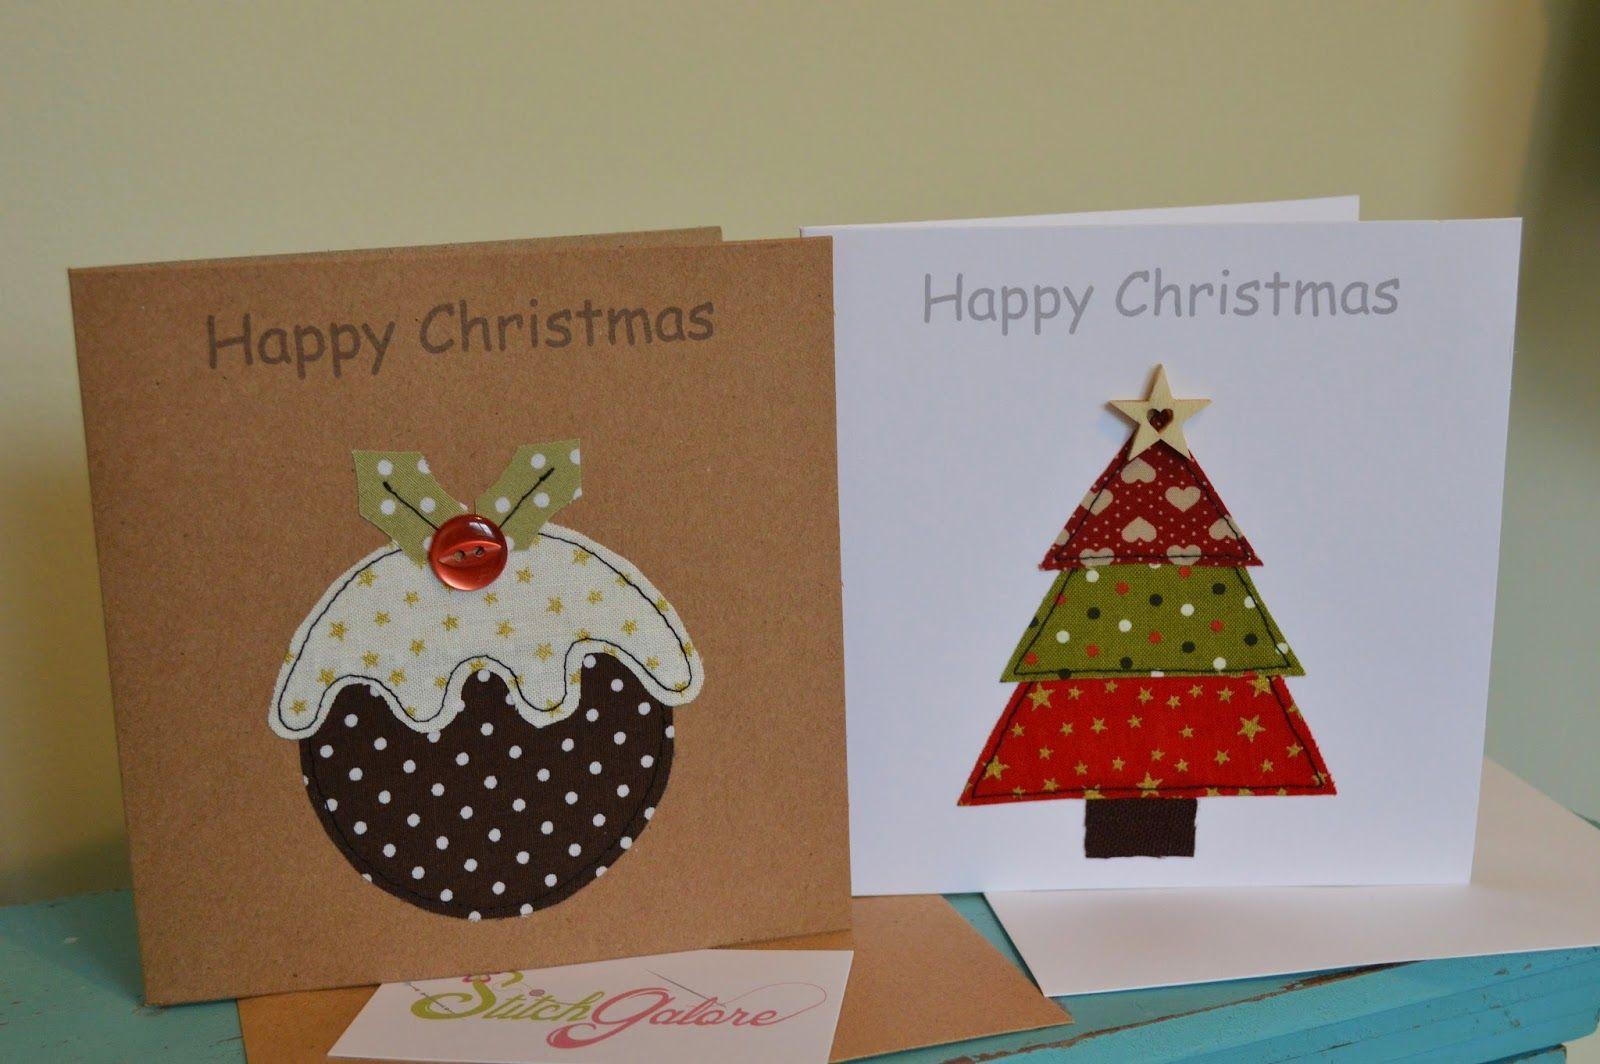 Stitch Galore: Handmade Christmas Cards | card | Pinterest ...